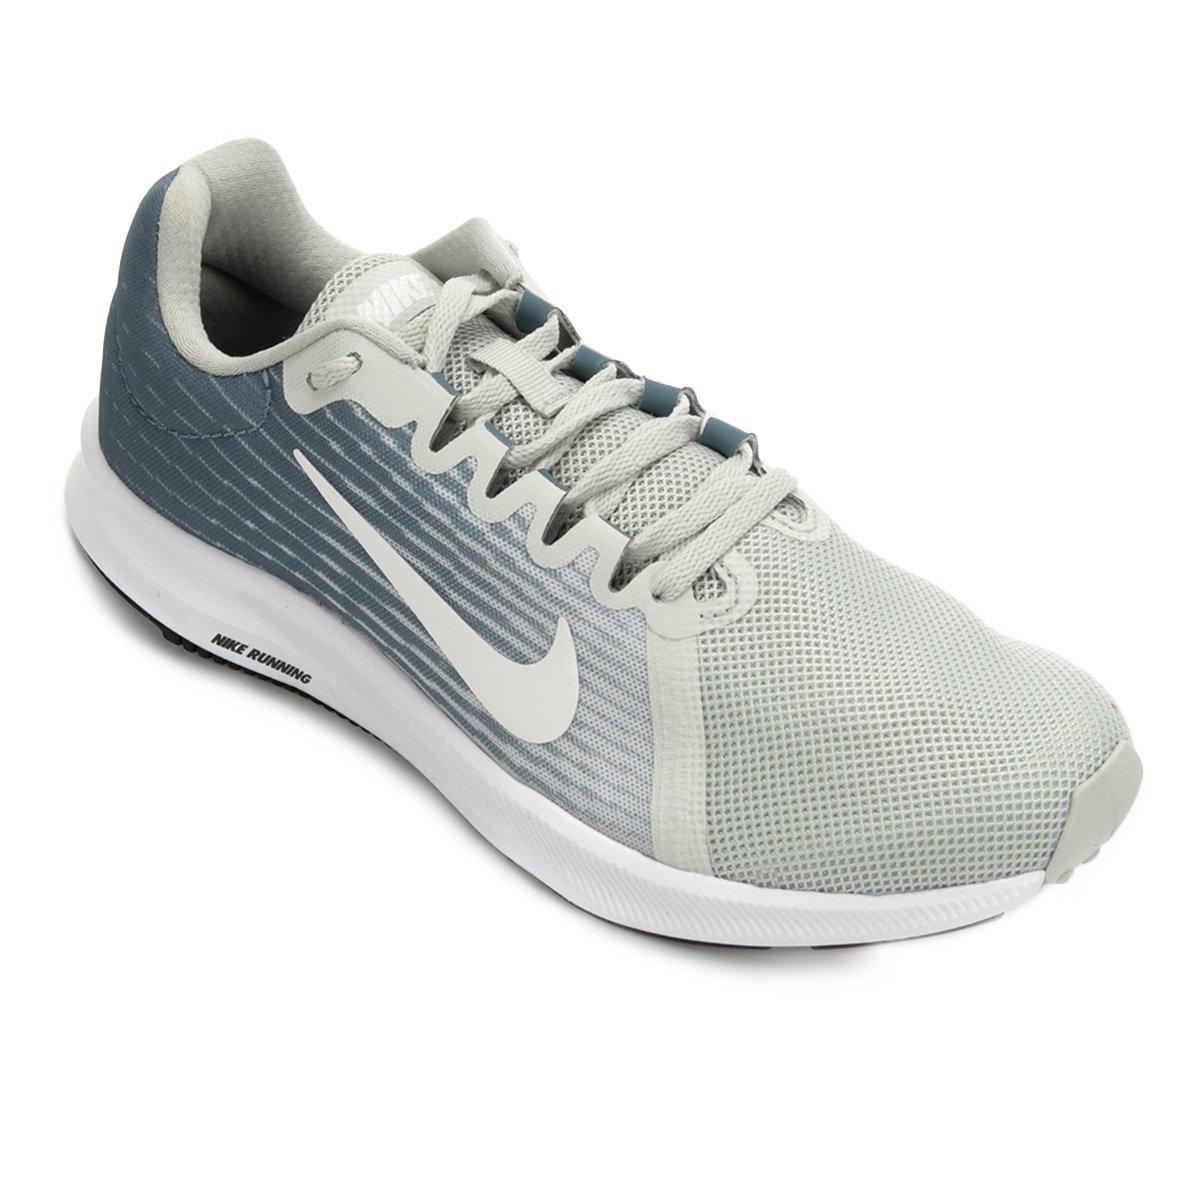 Tênis Nike Wmns Downshifter 8 Feminino - Azul e Chumbo - Compre ... ed17097fda